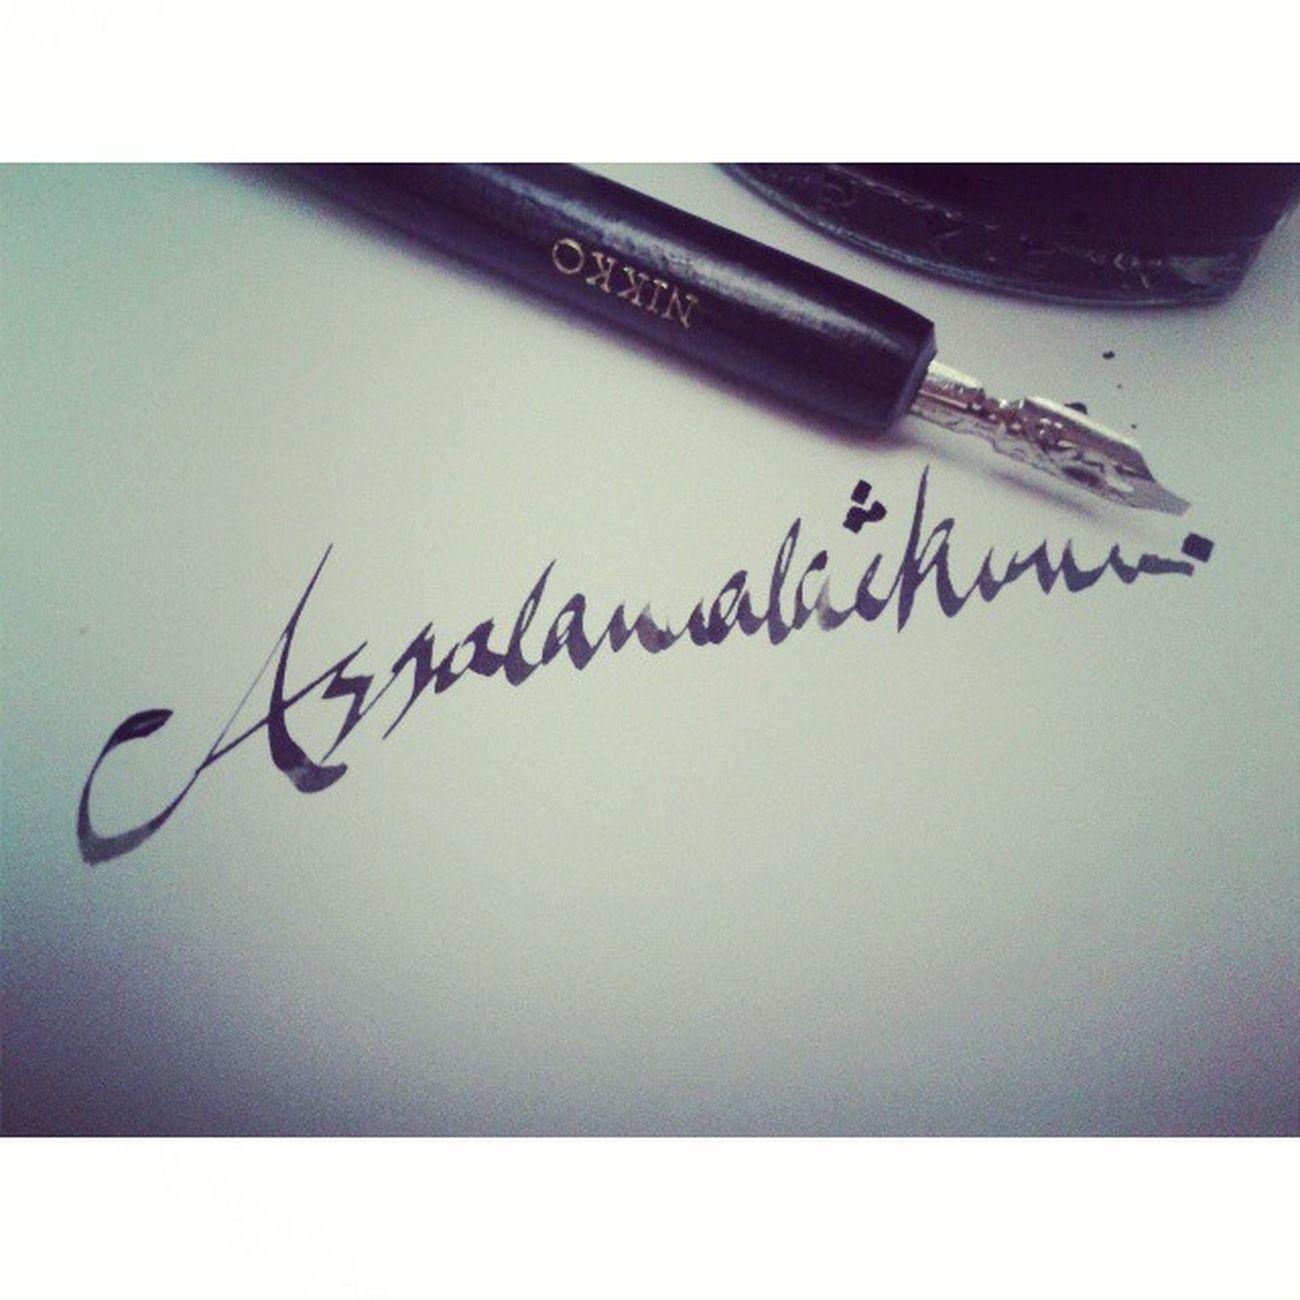 Dah lame tak buat kaligrafi Assalamualaikum Calligraphy Nibpen